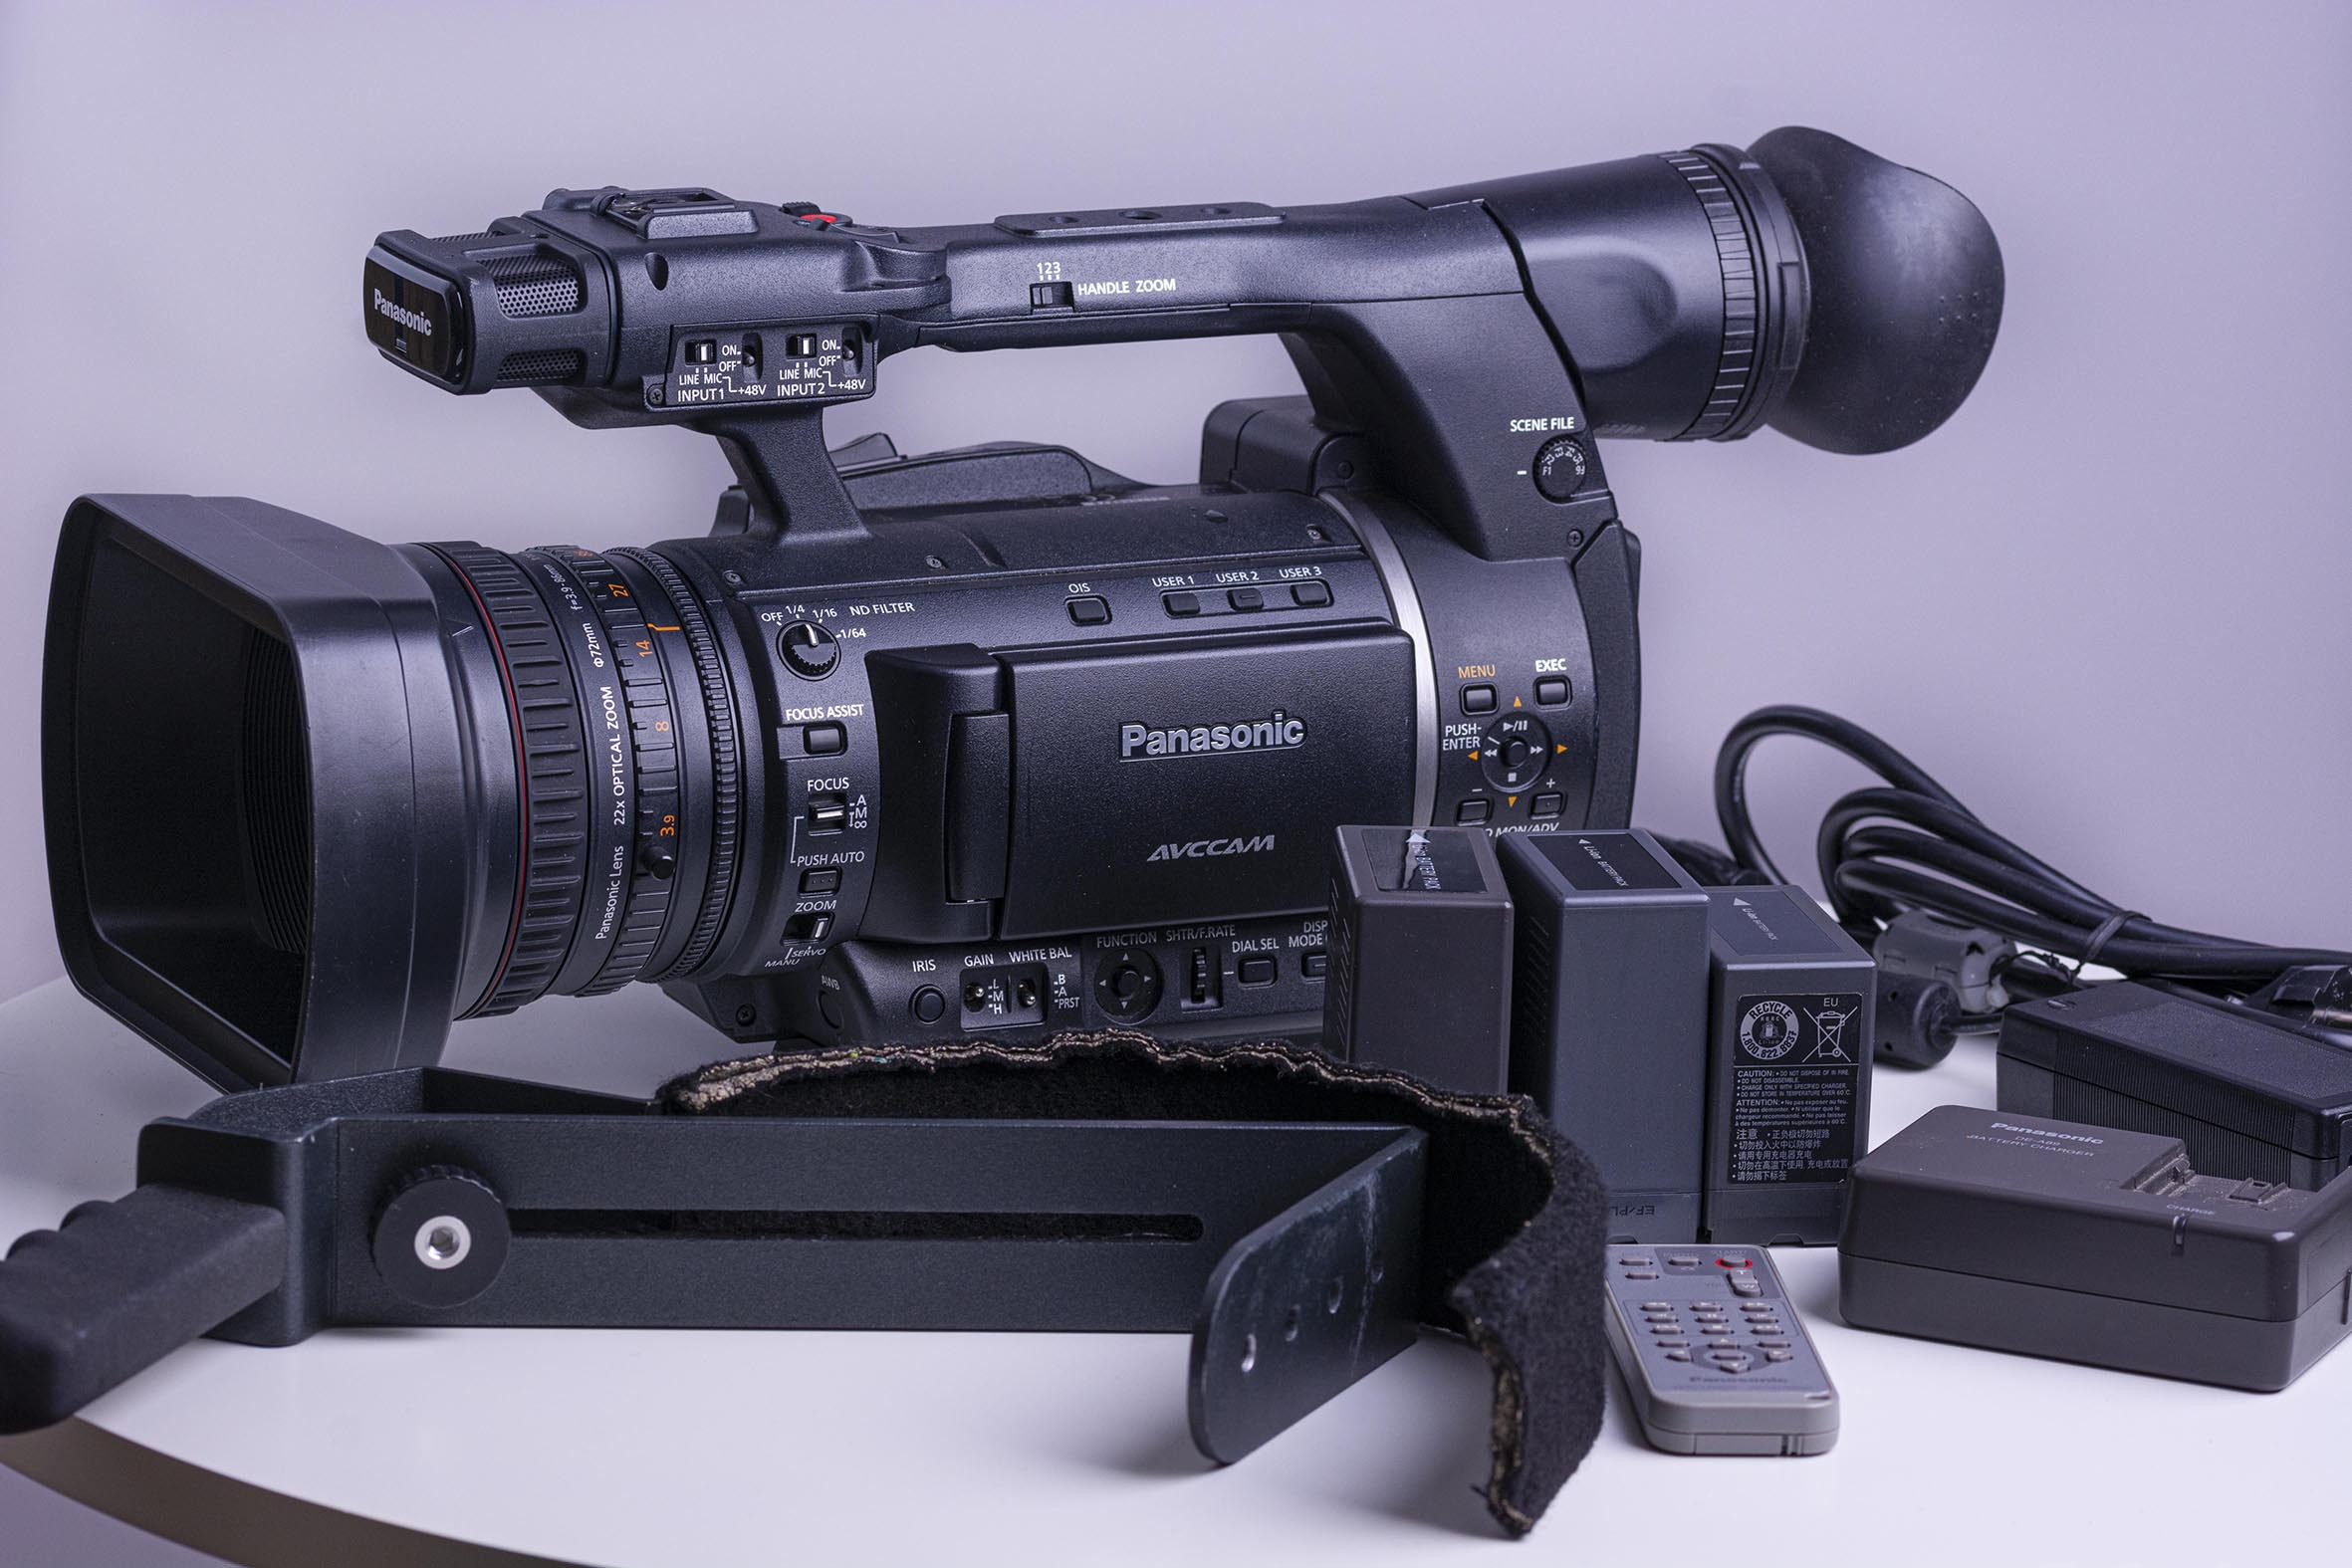 Pro-HD-Camcorder Panasonic AG-AC 160